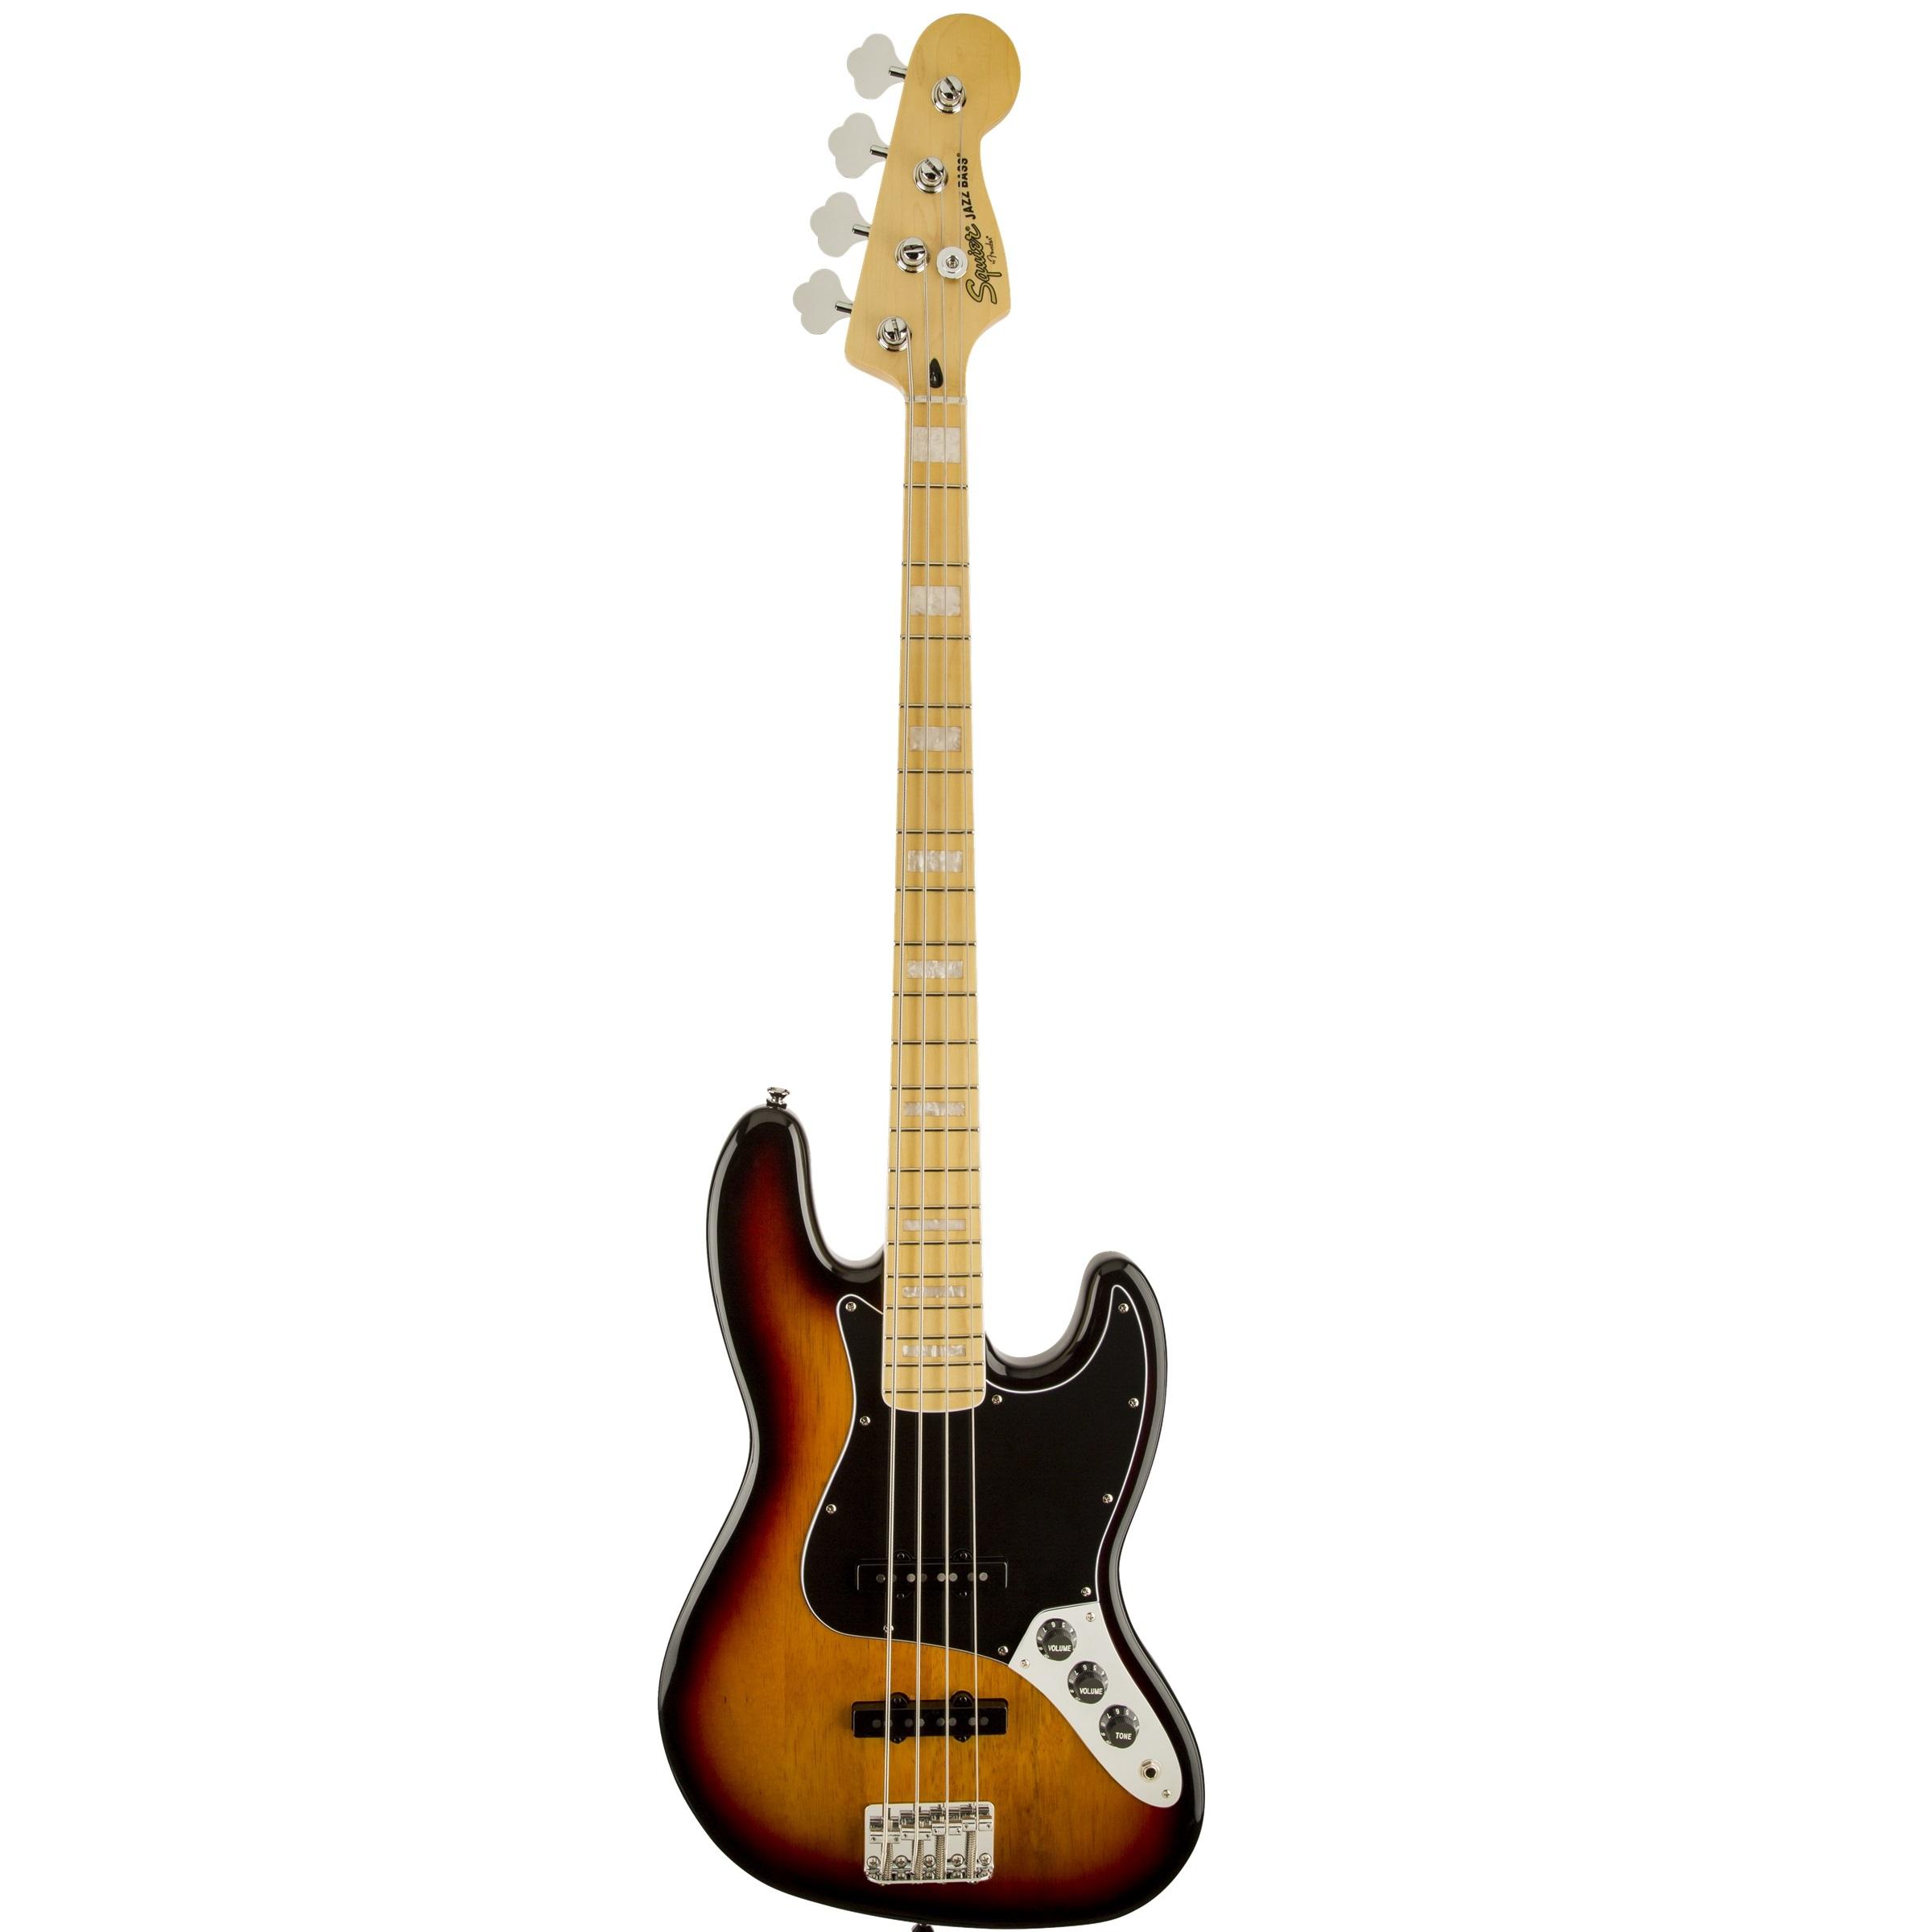 Fender Squier '77 Vintage Modified Jazz Bass - 3 Tone Sunburst